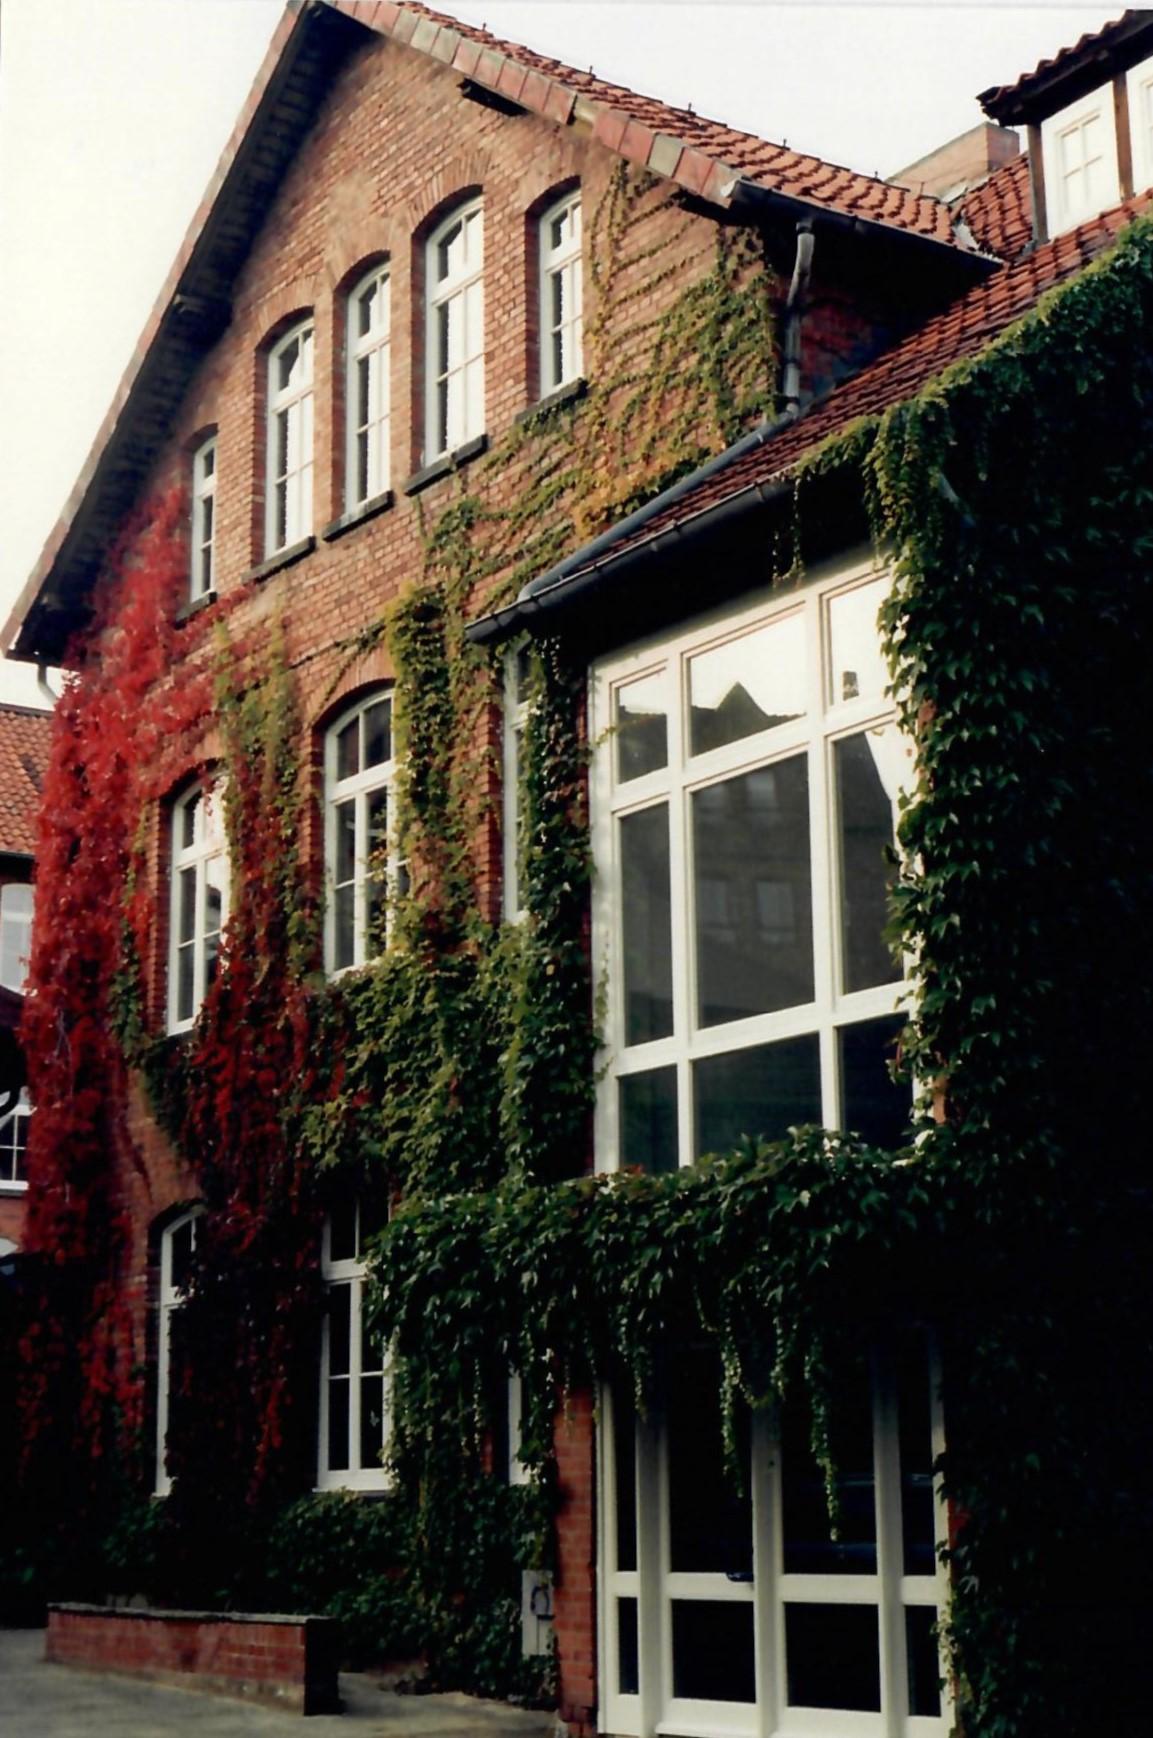 images/Seminarchronik/Brauhausstr_Gebude_2.jpg